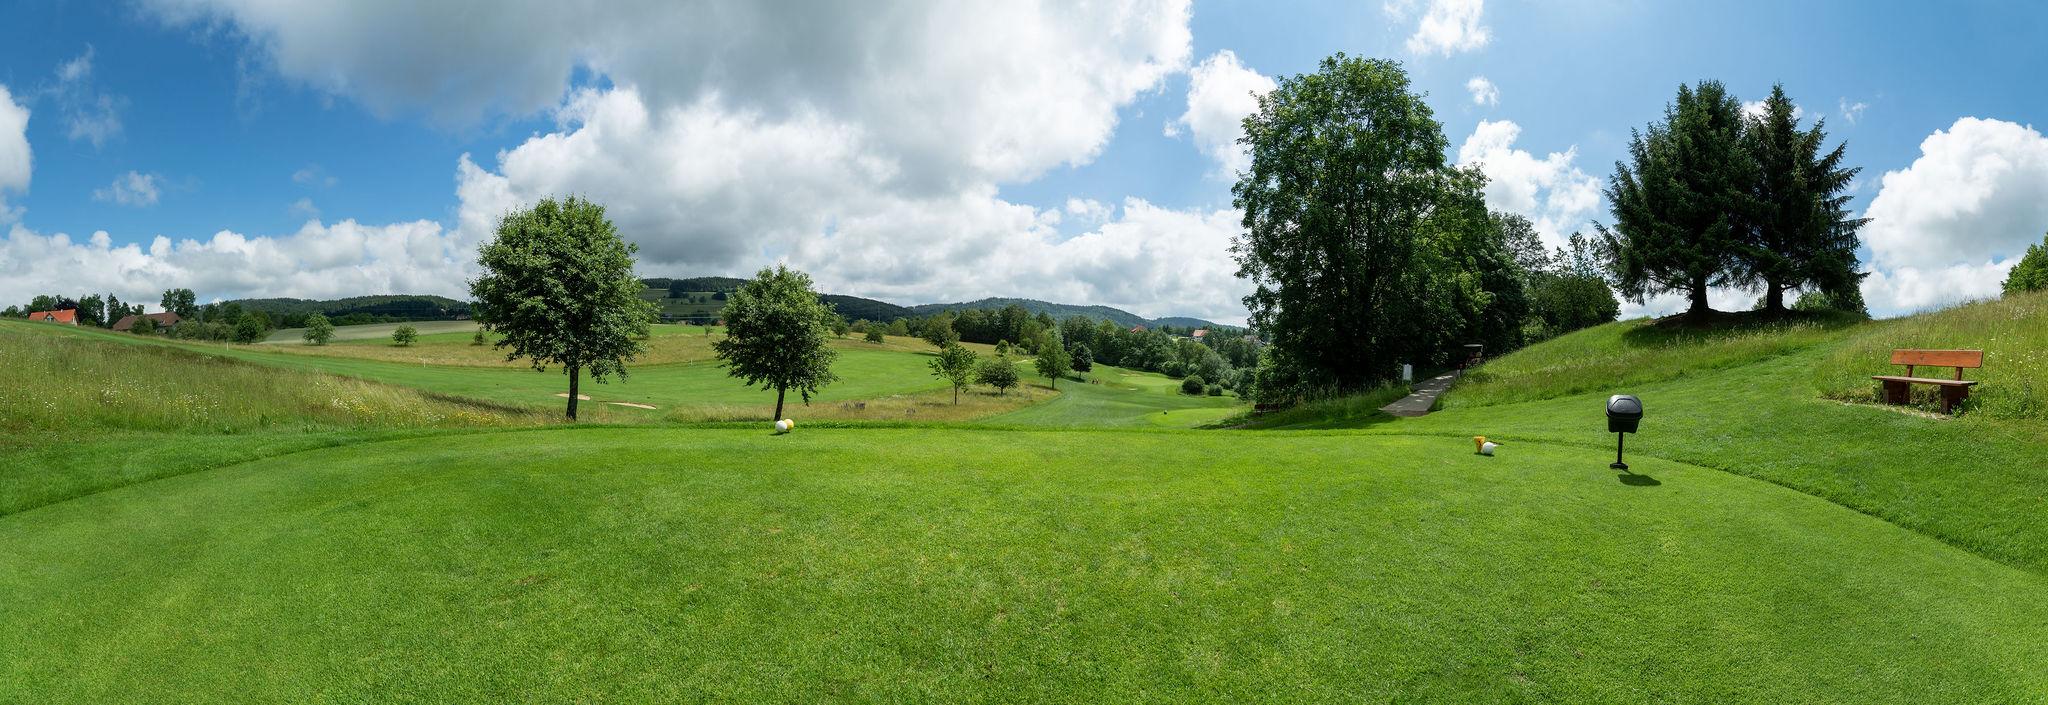 Golfkurse Rickenbach